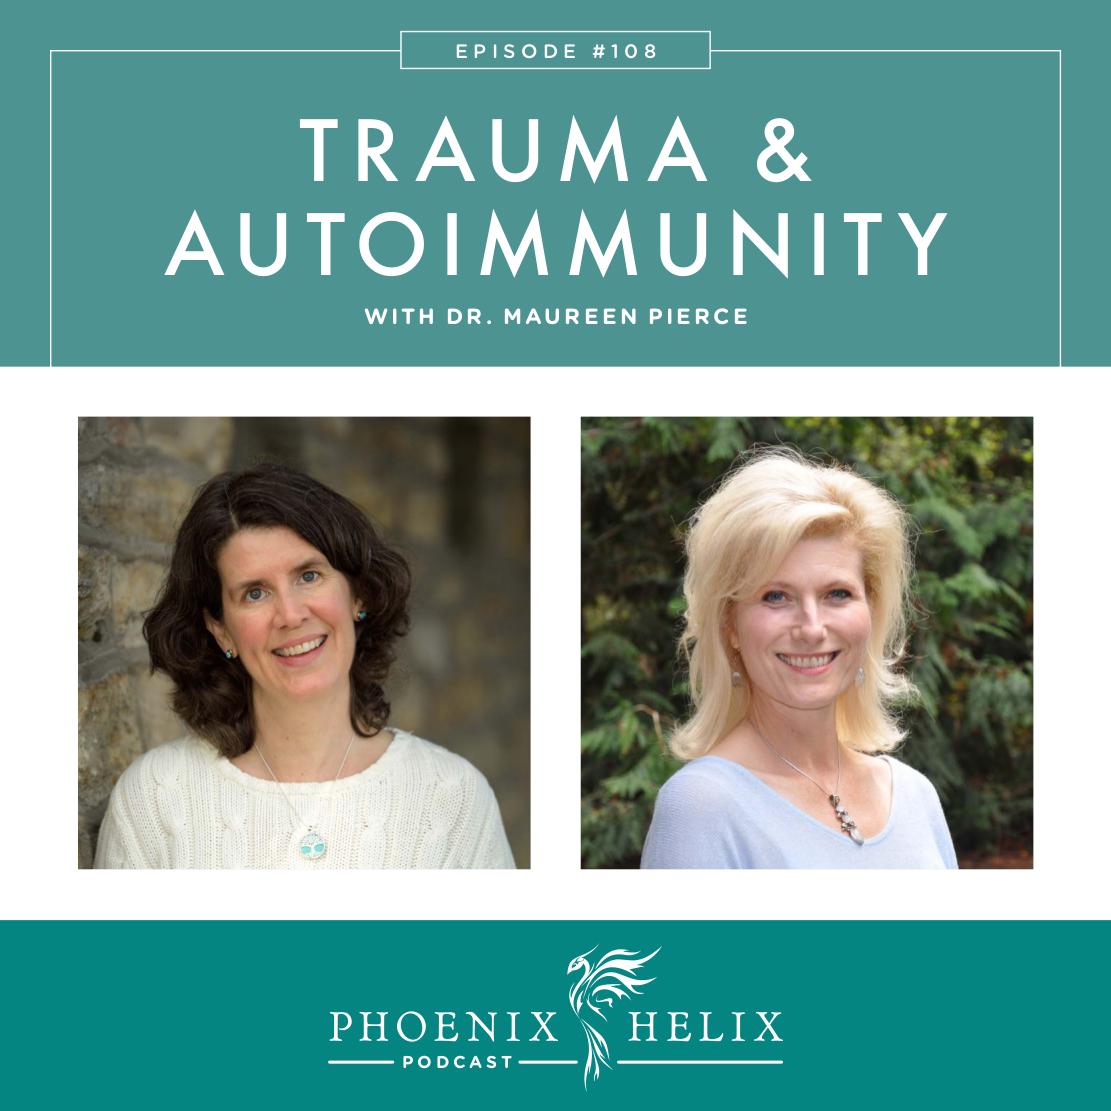 Trauma & Autoimmunity with Dr. Maureen Pierce | Phoenix Helix Podcast